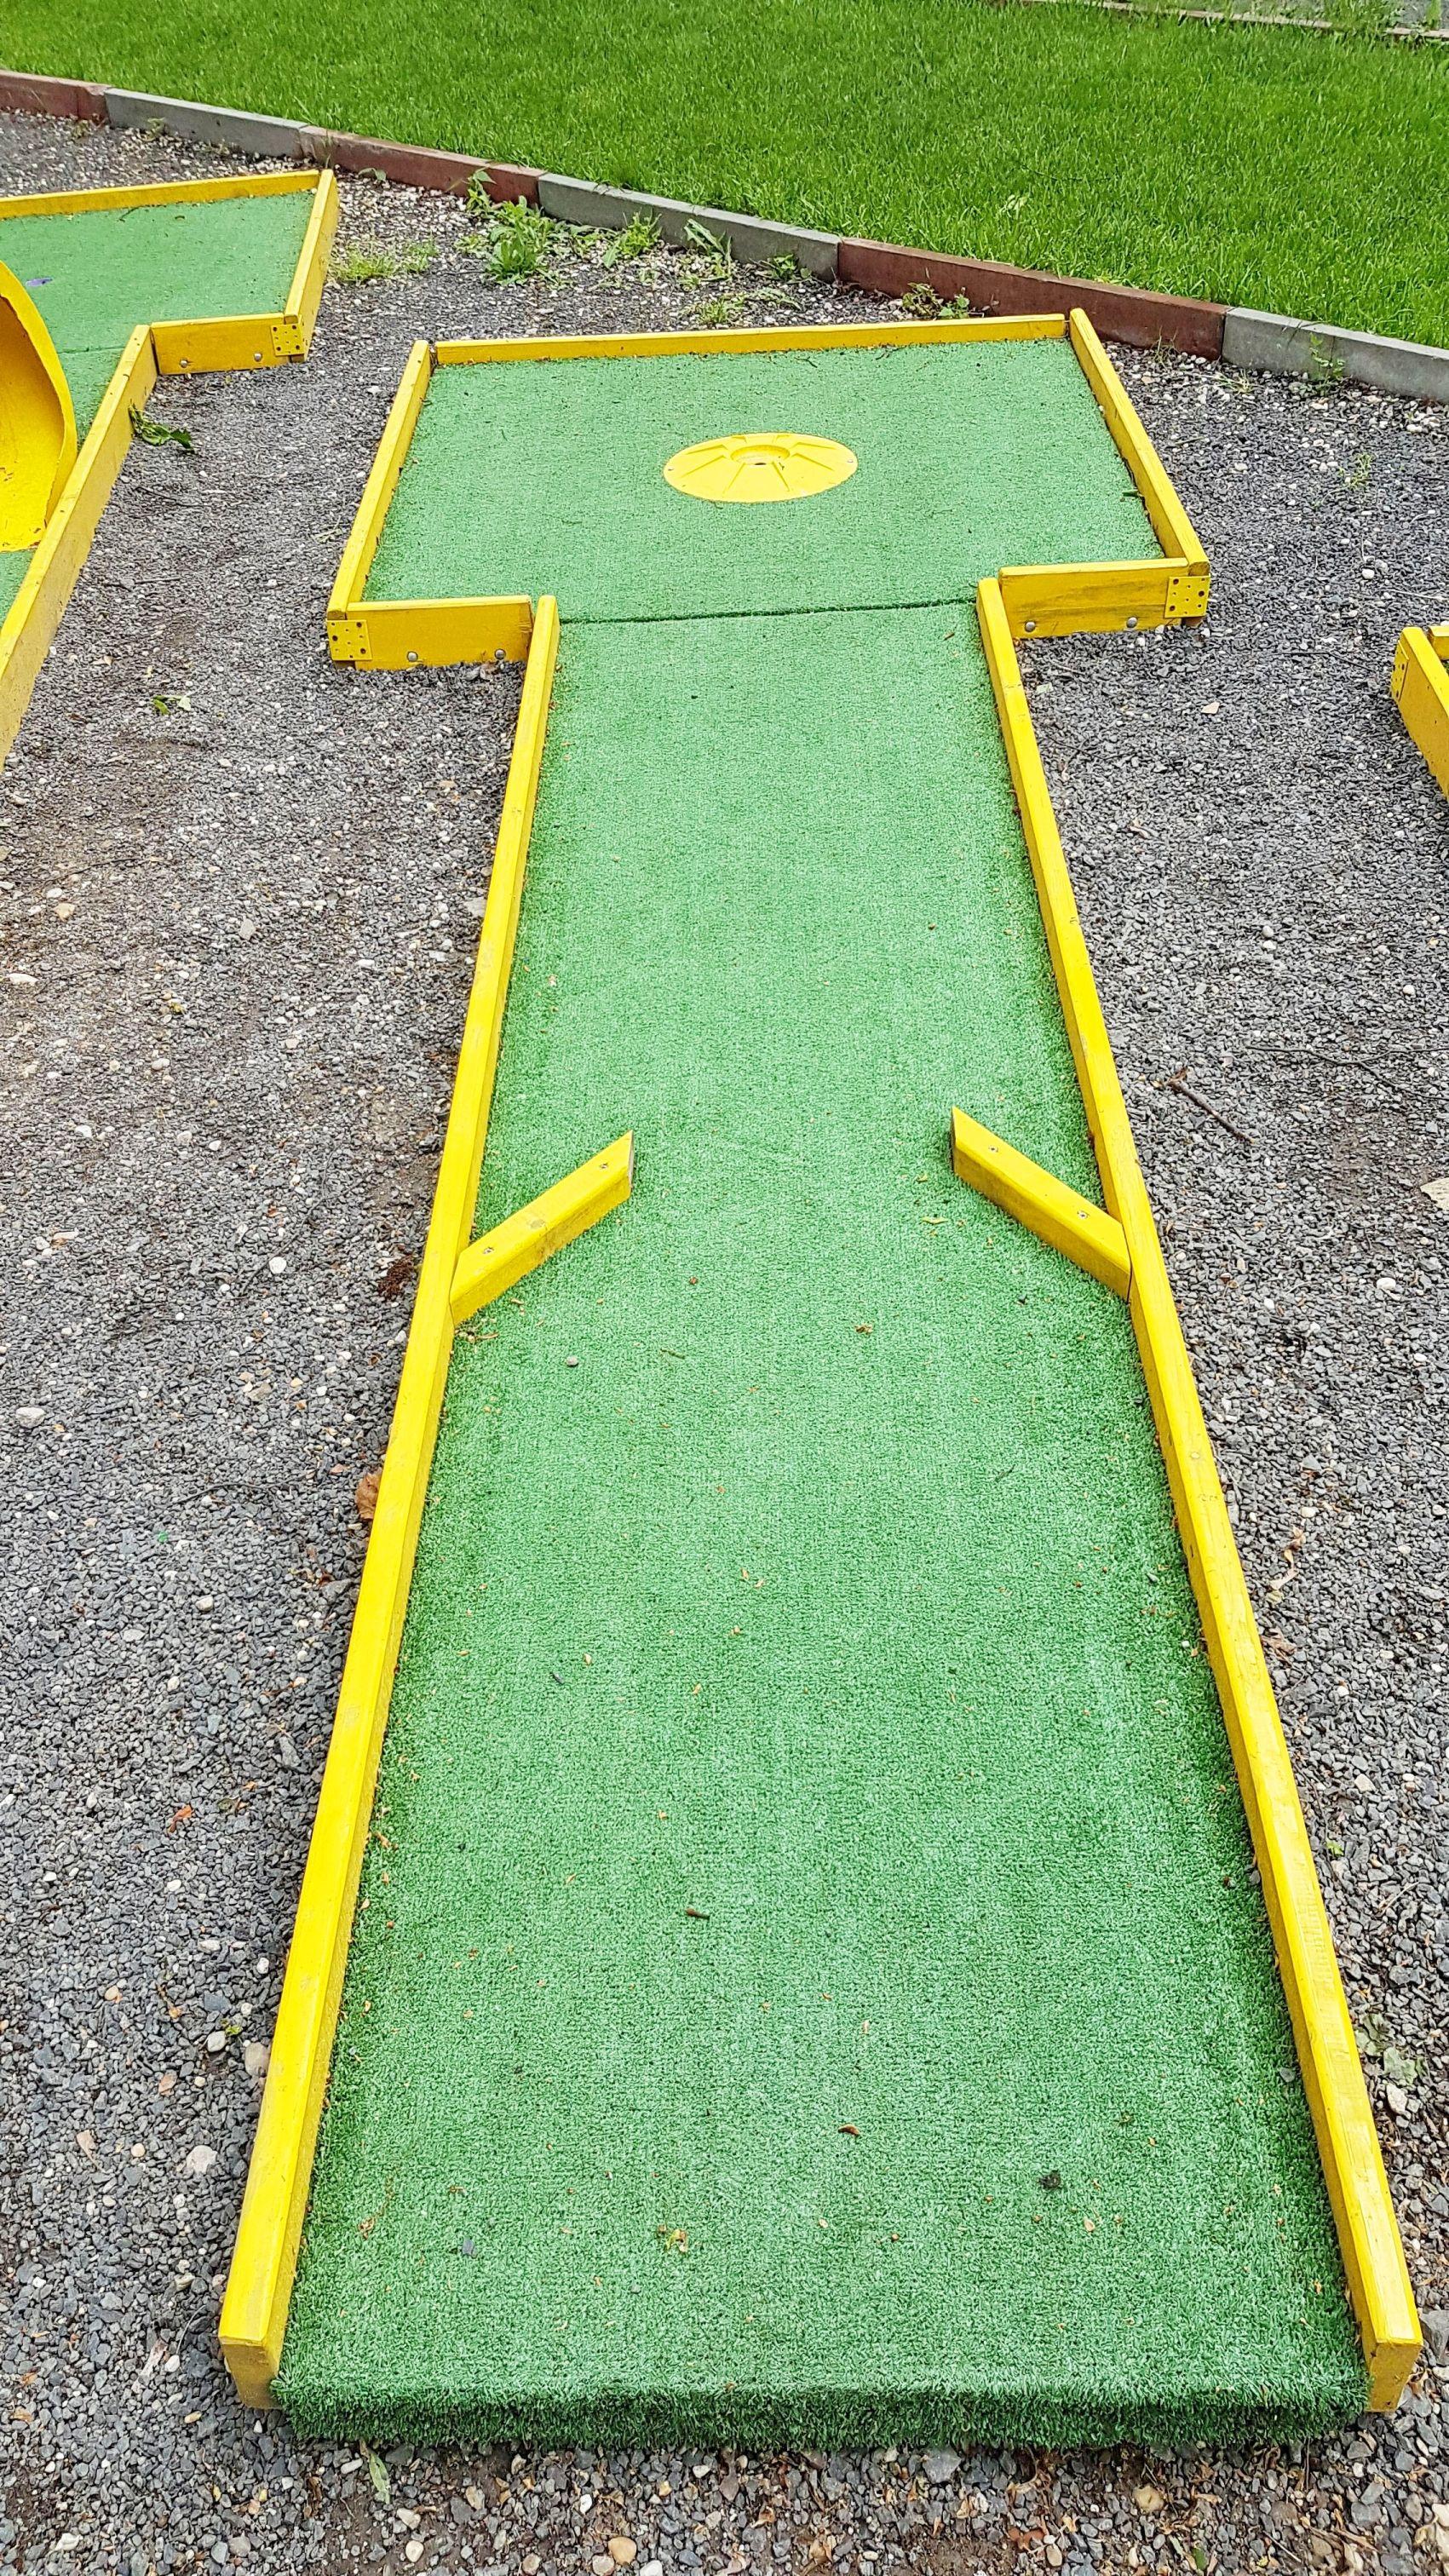 Anjahome Bullet Journal Tips Hacks Ideas Outdoor Mini Golf Backyard Putting Green Indoor Mini Golf Backyard diy mini golf